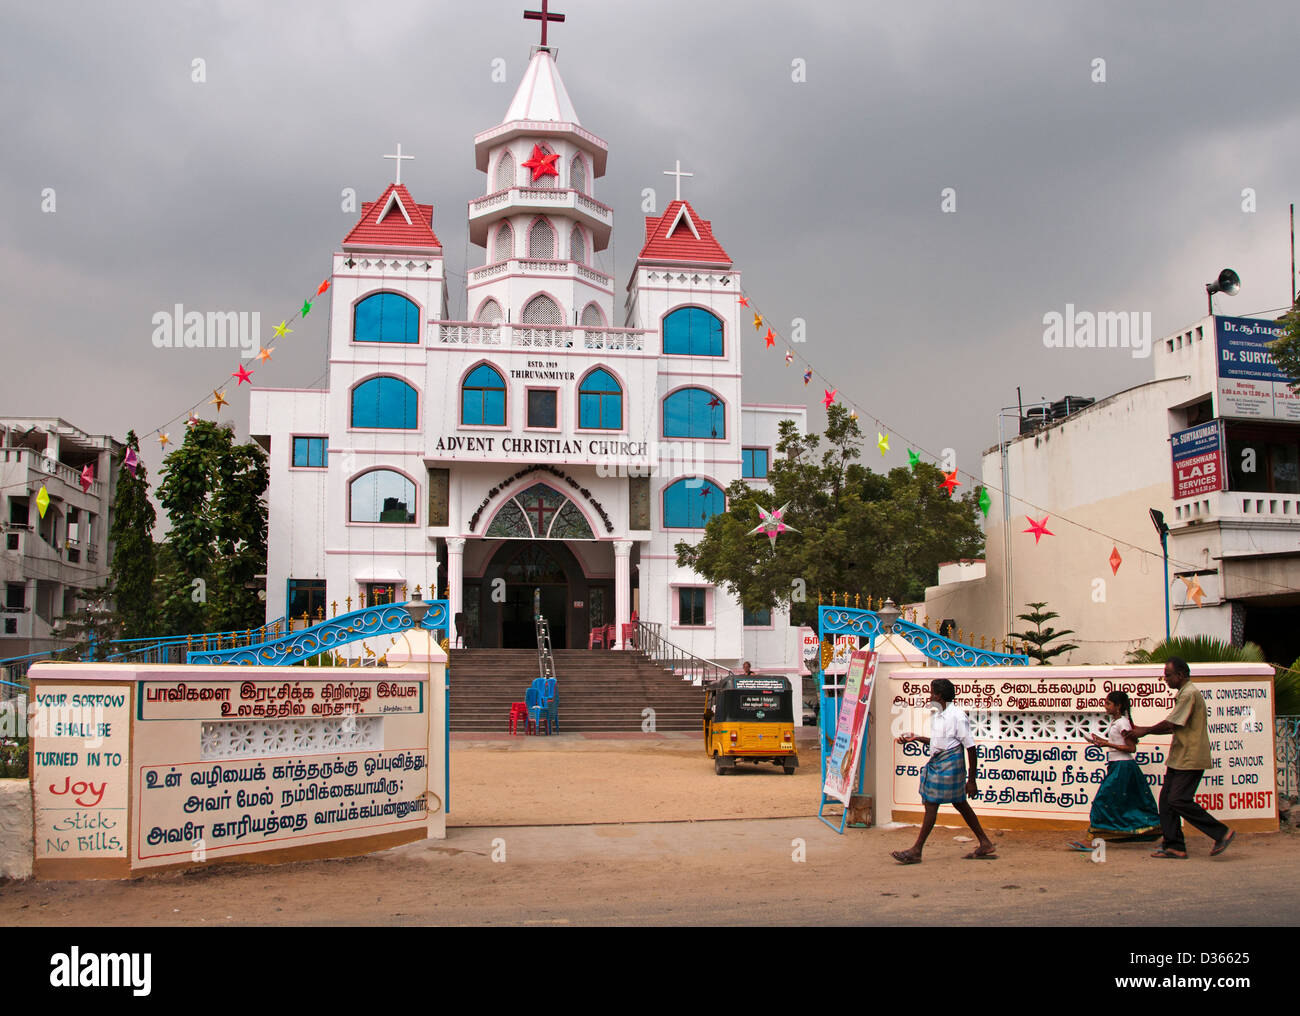 Advent Christian Church 1919 Thiruvanmiyur Chennai ( Madras ) India Tamil Nadu - Stock Image